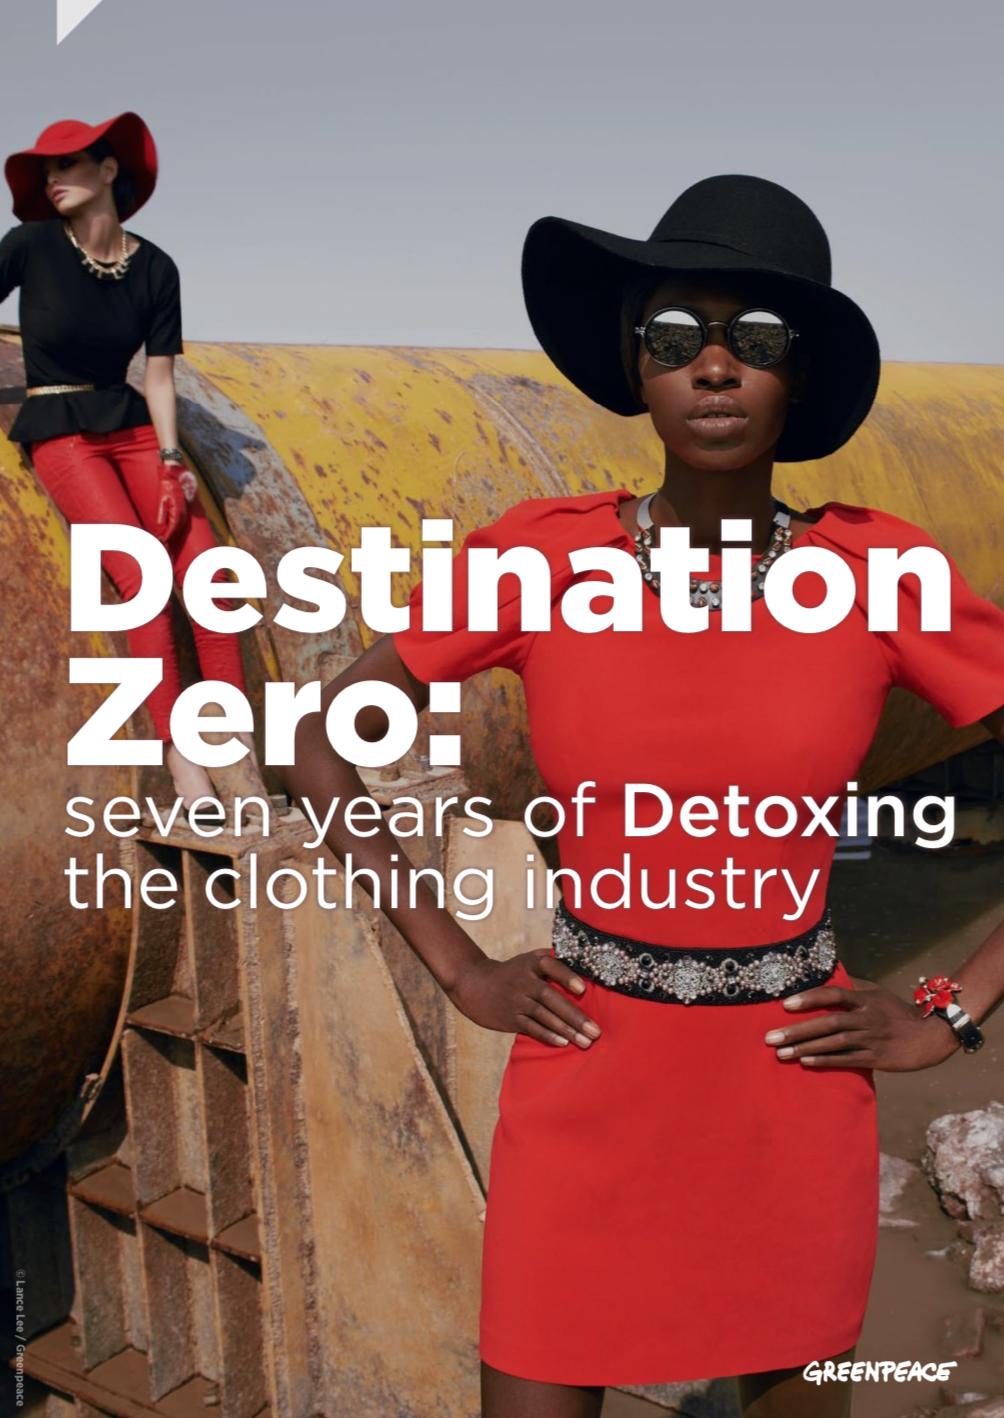 Destination Zero Greenpeace Detox